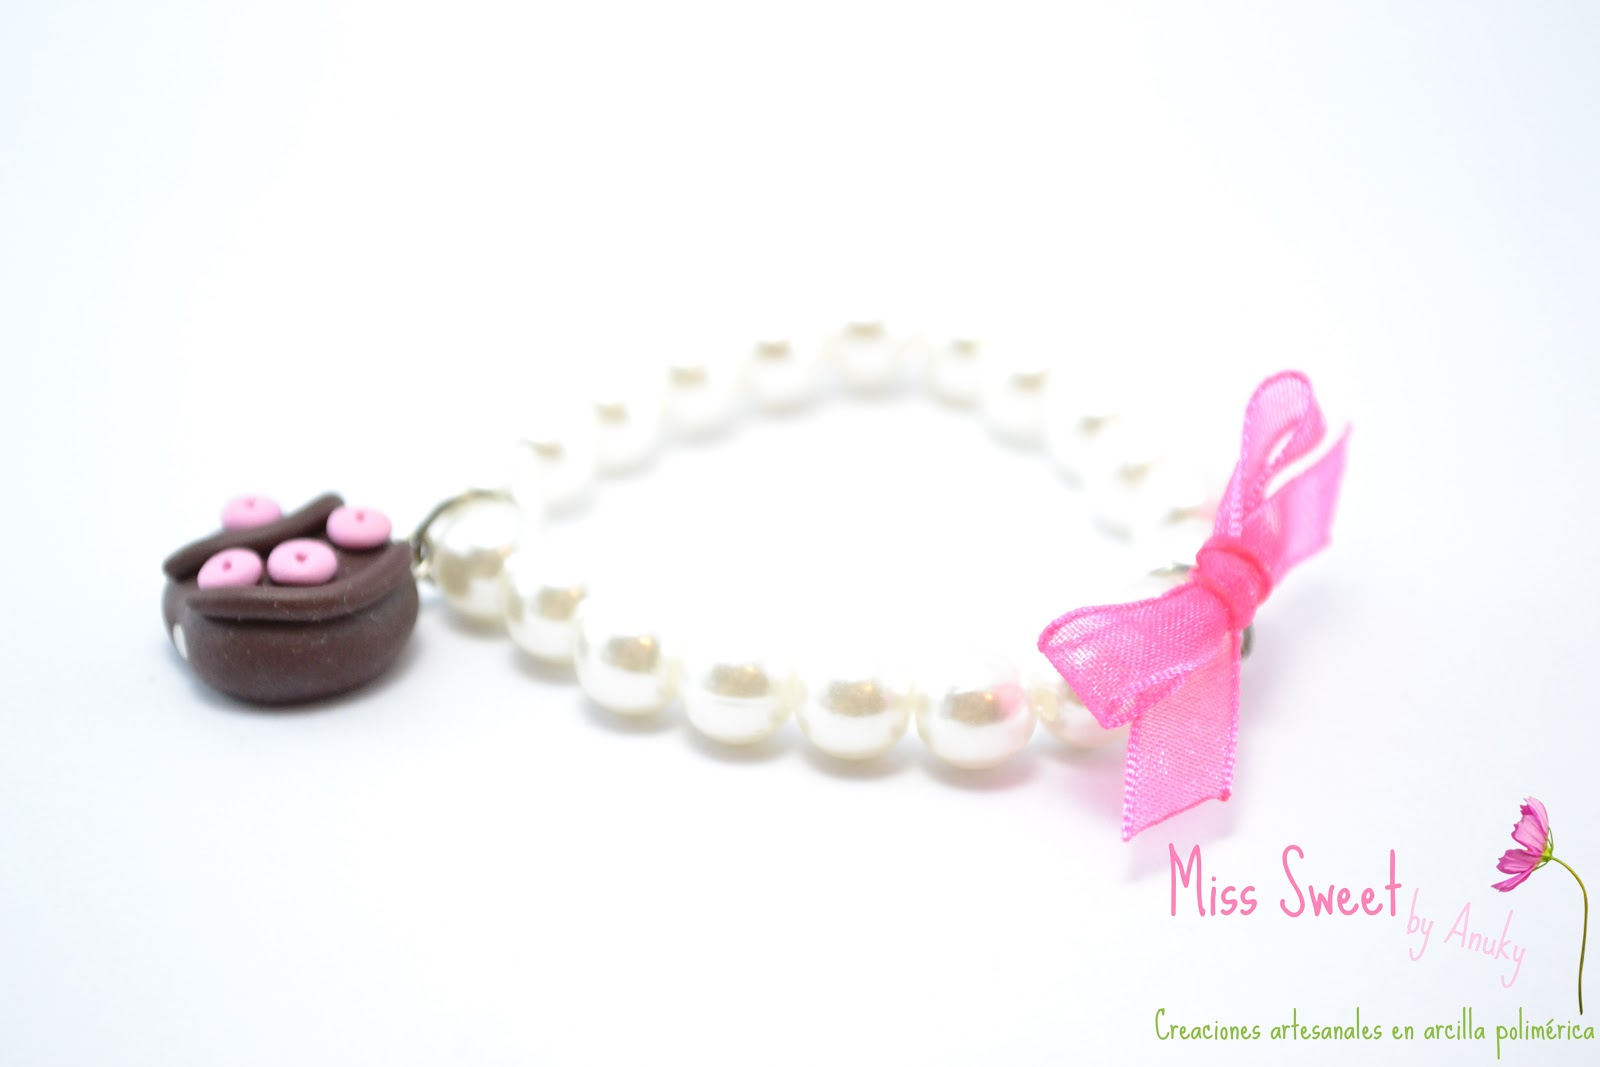 Conociendo_a_Miss_Sweet_The_Pink_Graff_07